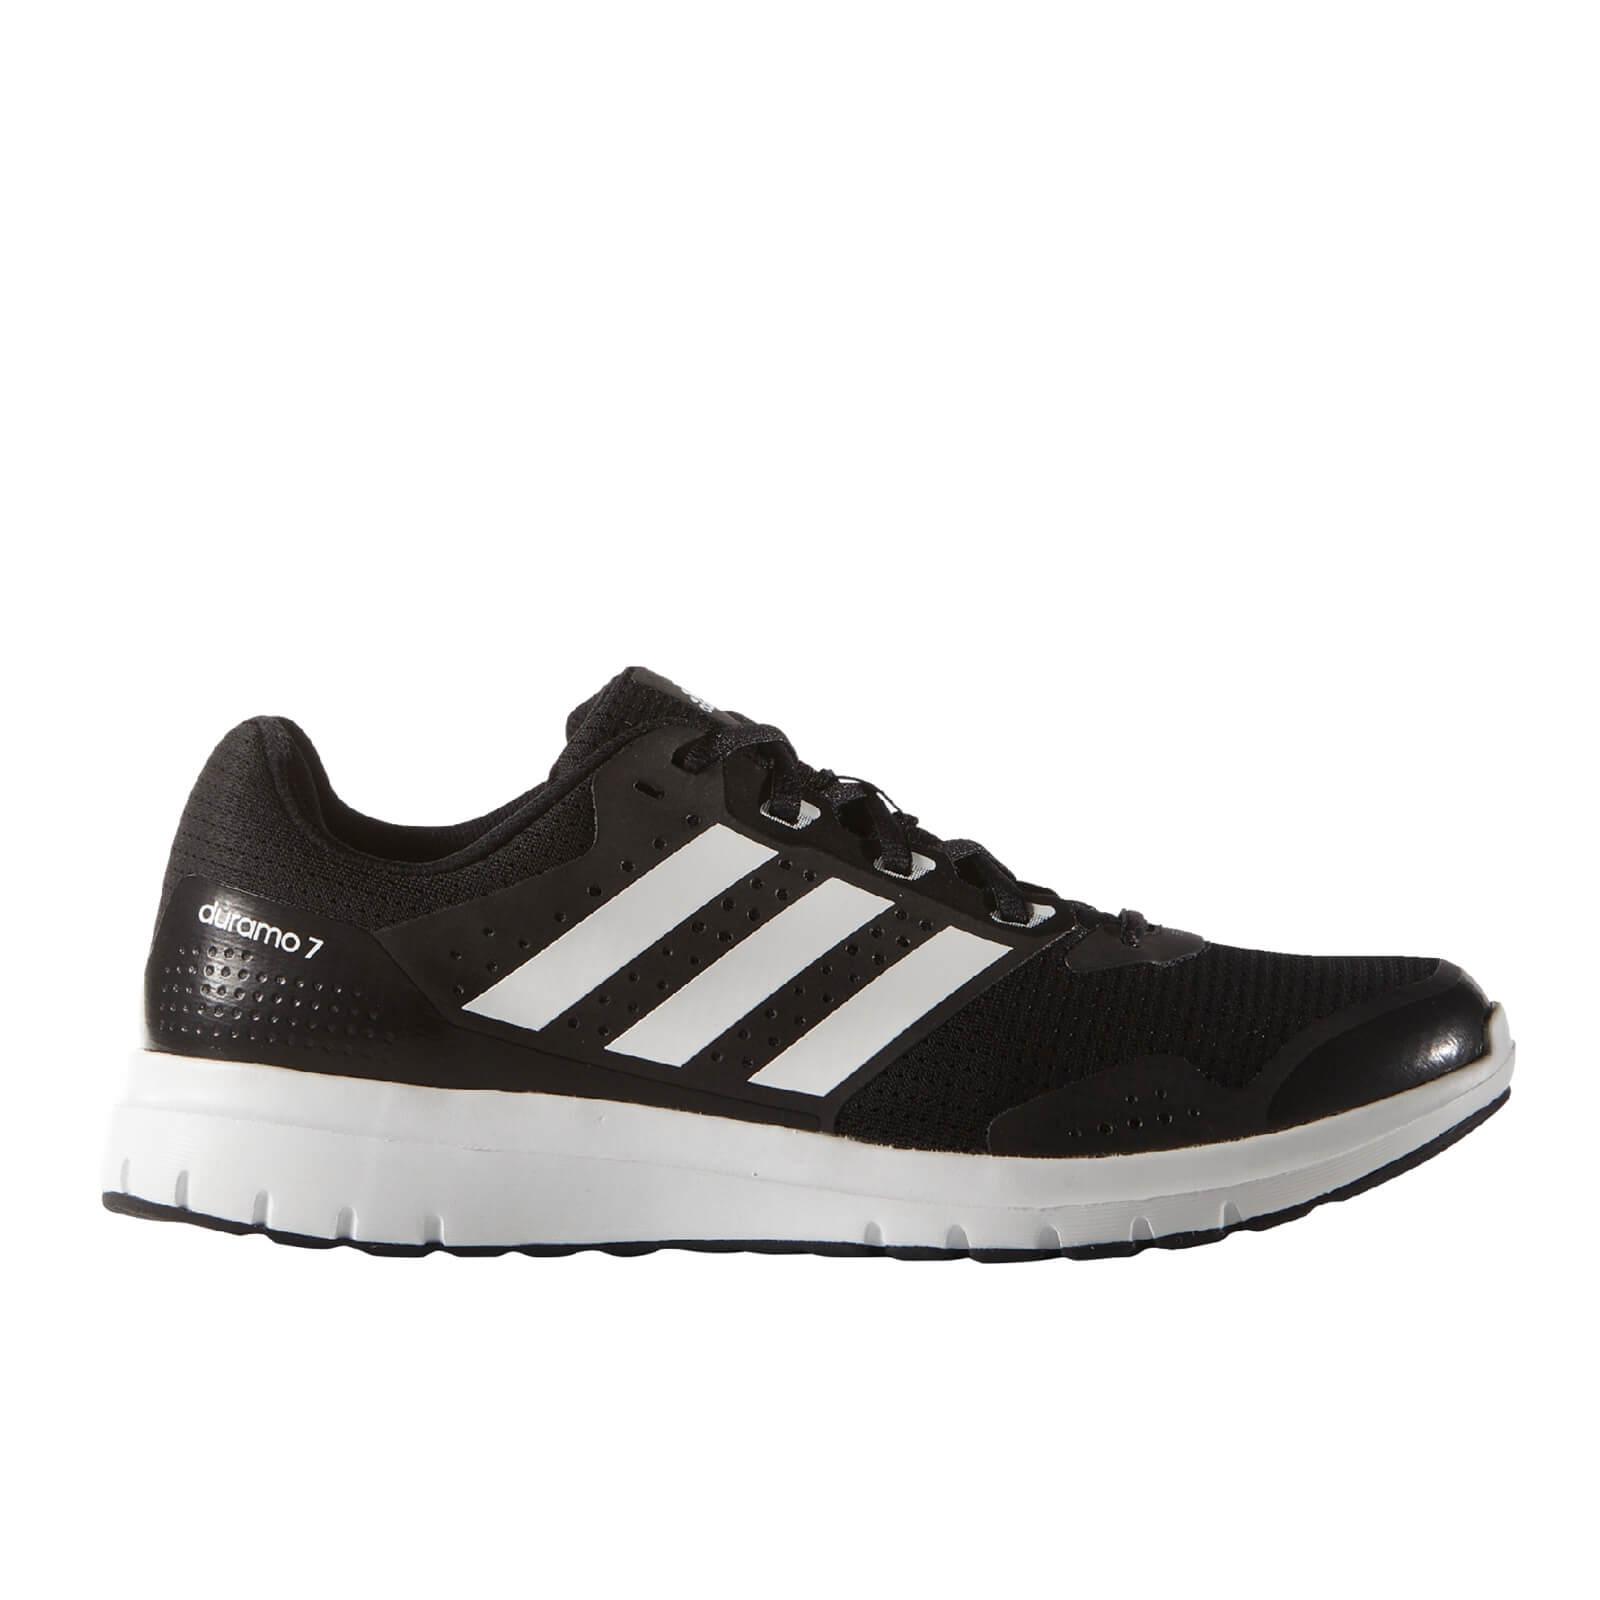 af89bae47d9 adidas Men s Duramo 7 Running Shoes - Black White